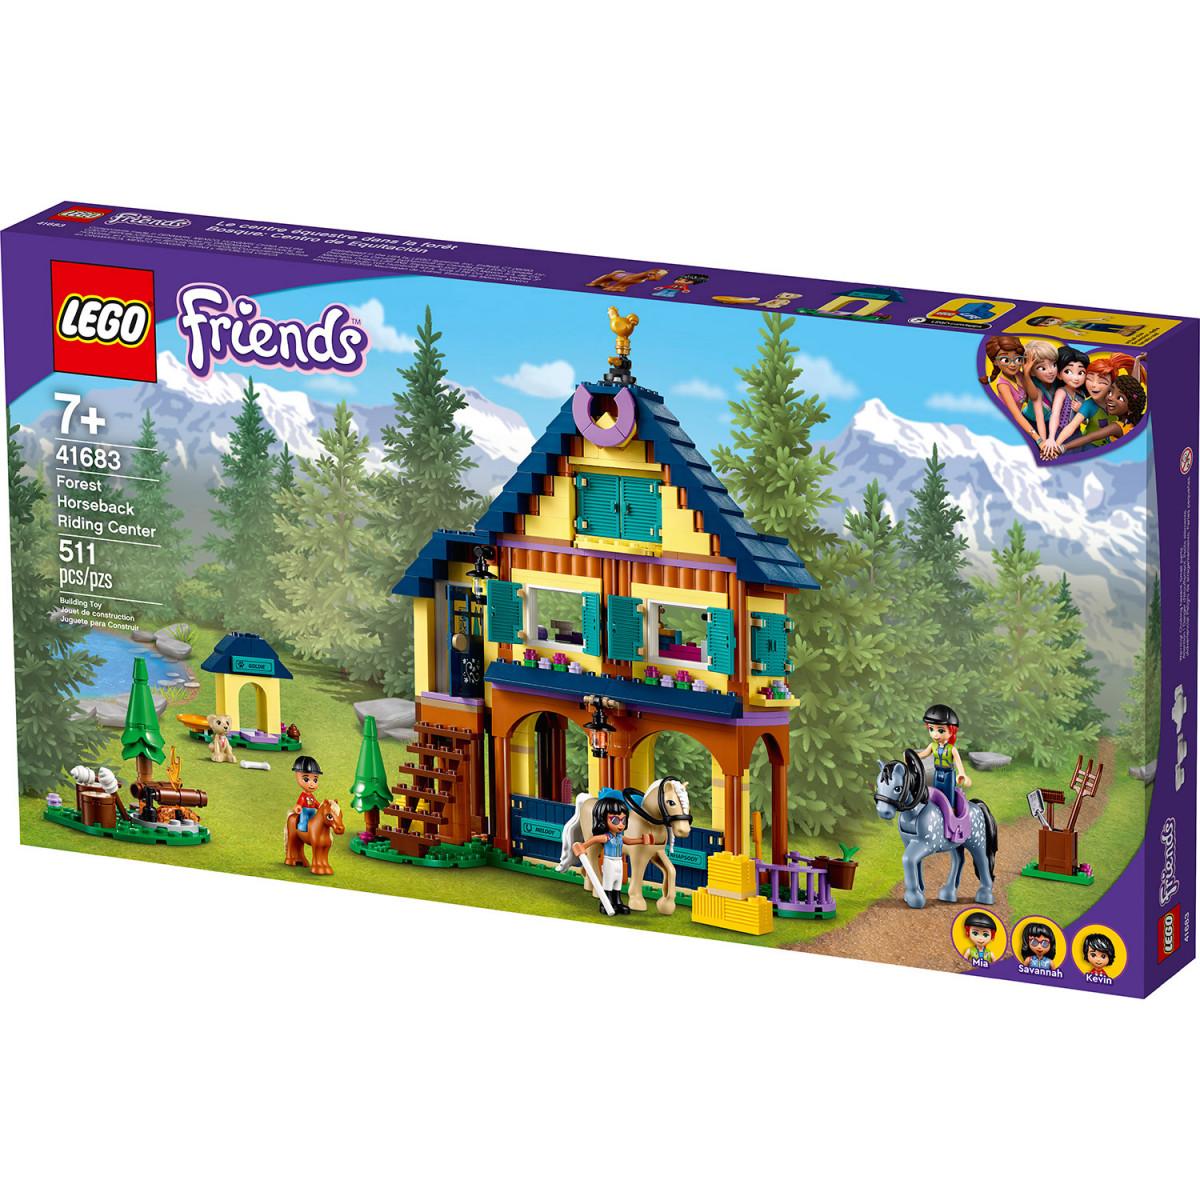 LEGO FRIENDS FOREST HORSEBACK RIDING CENTER